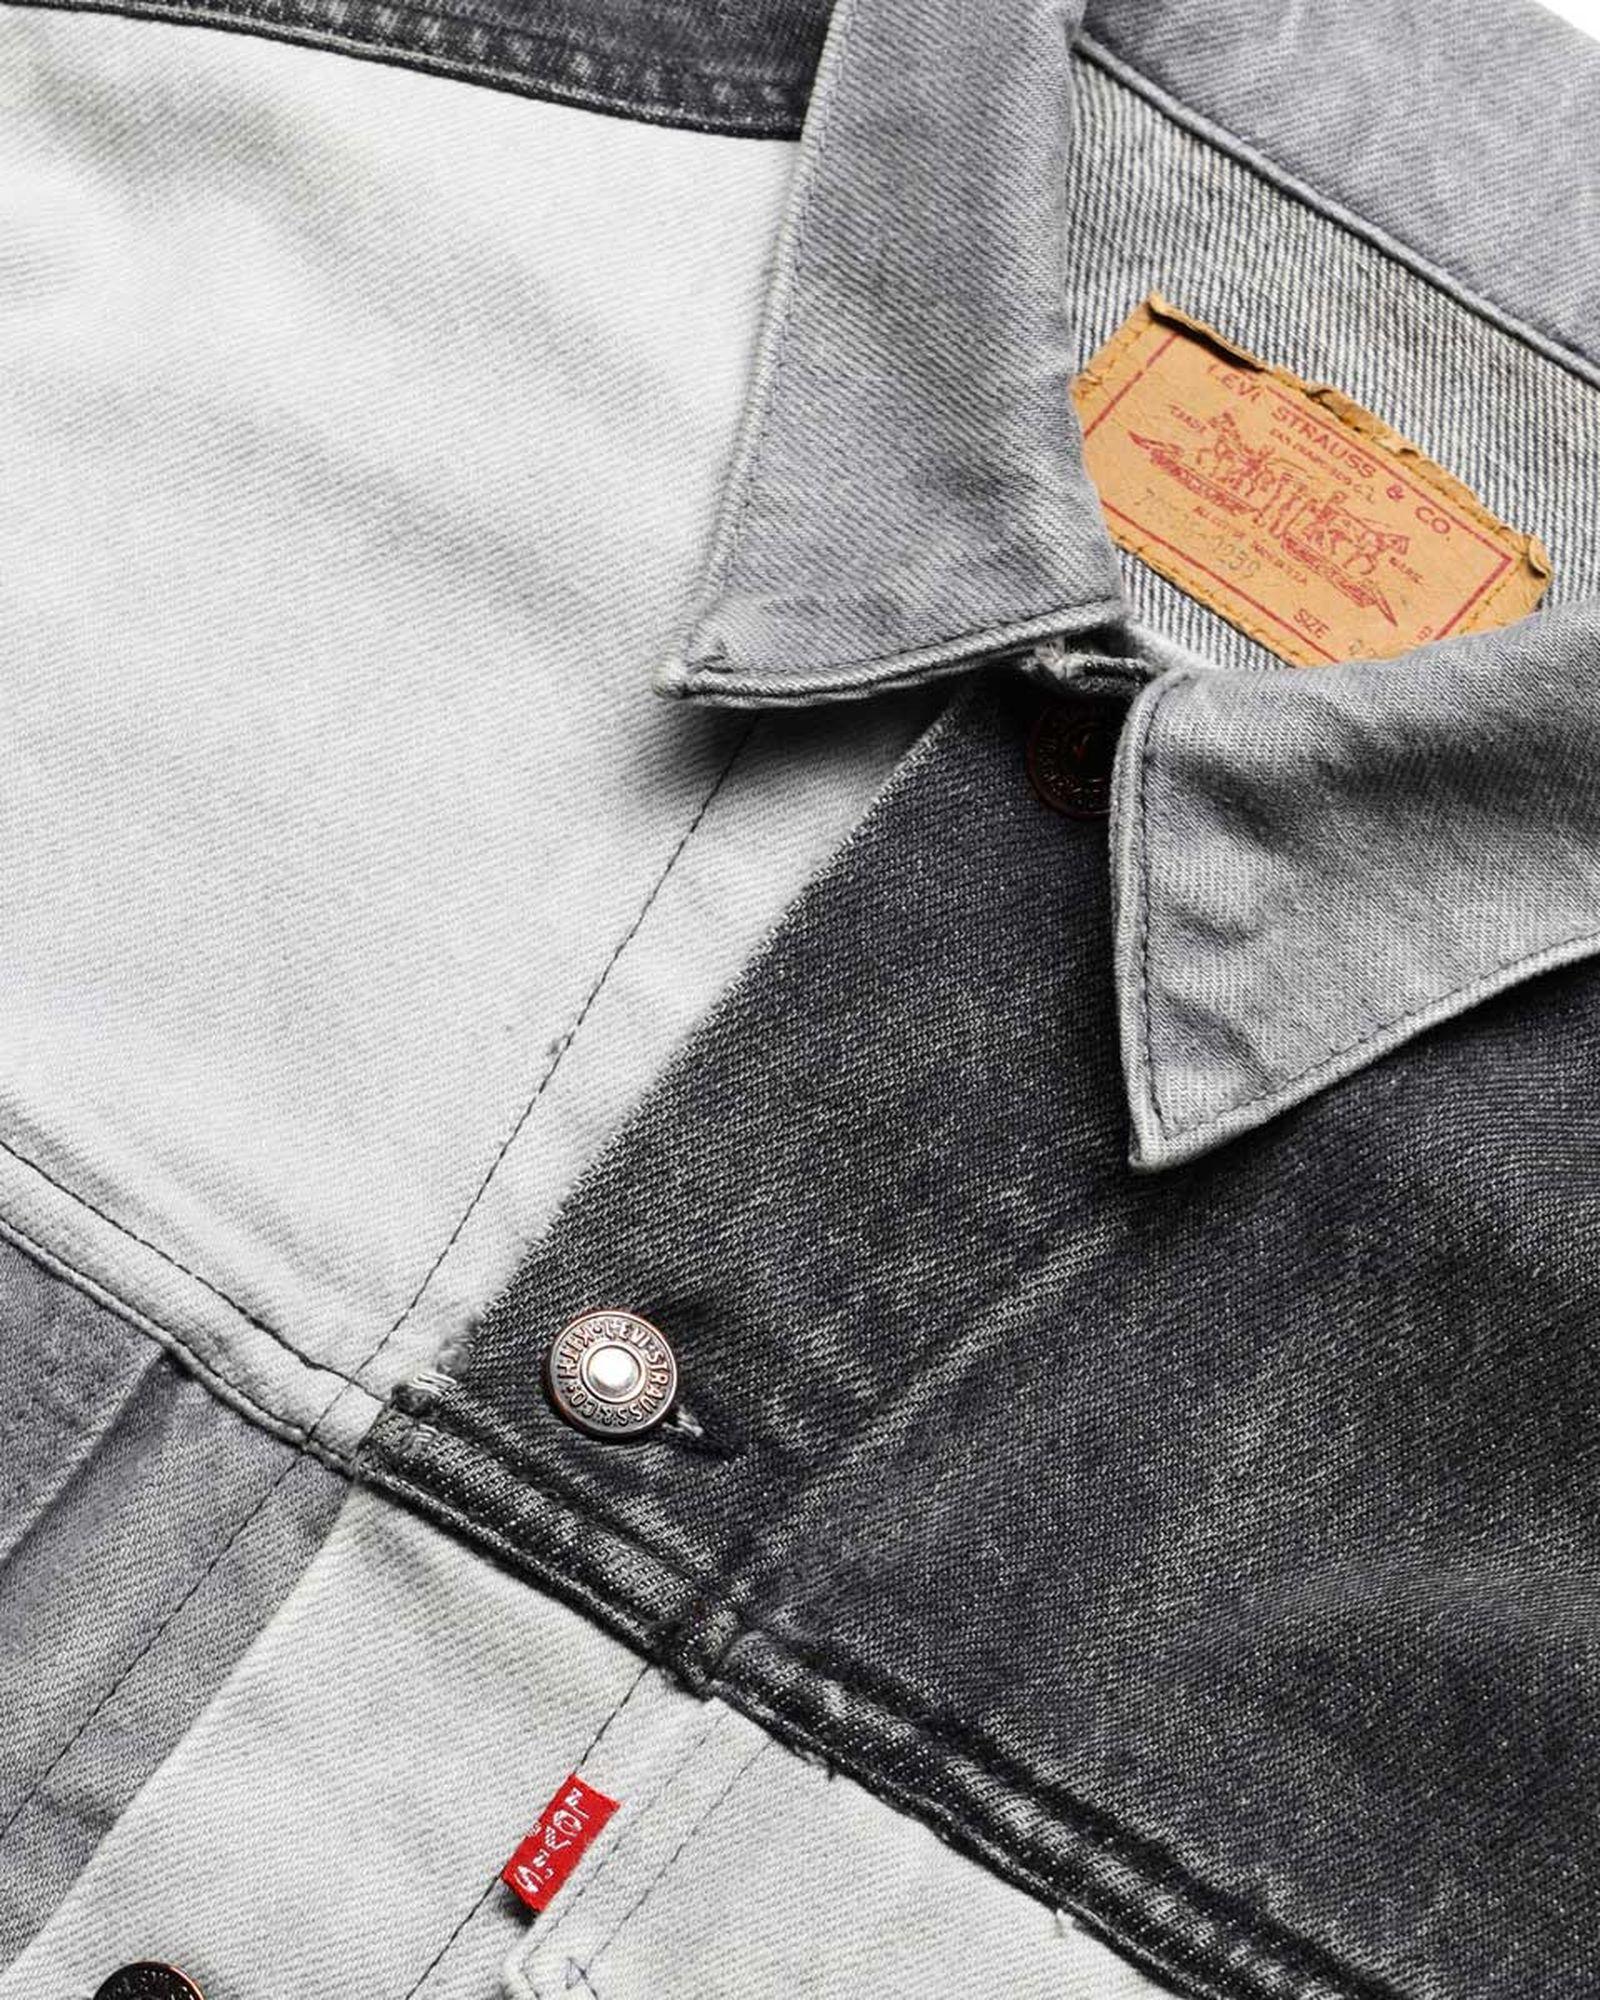 levis-authorized-vintage-new-balance-992-collab-(12)